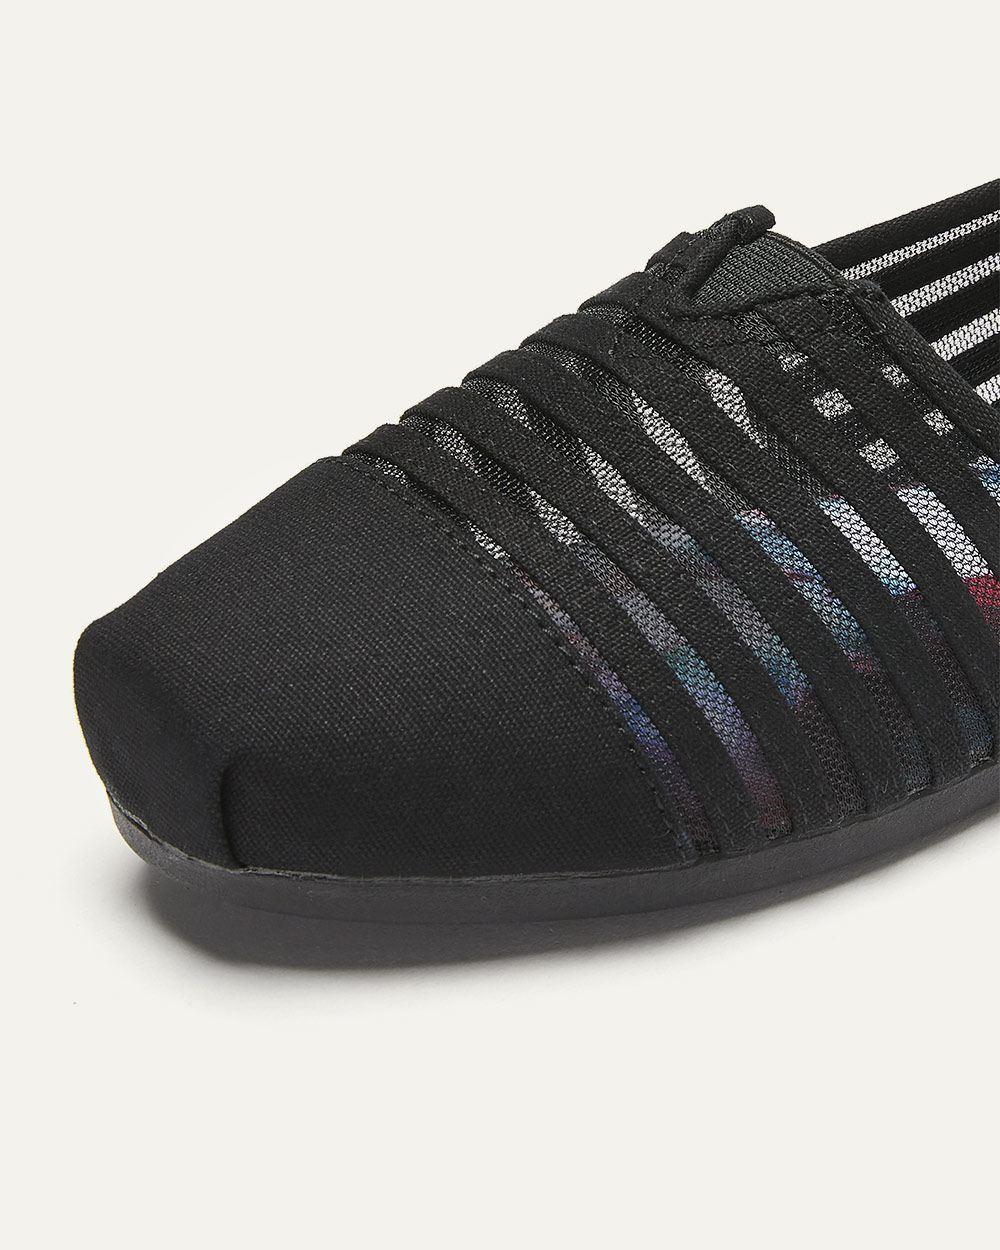 9c1eab6811658 Skechers Bobs Plush, Adorbs - Wide Width Slip On Flat | Penningtons